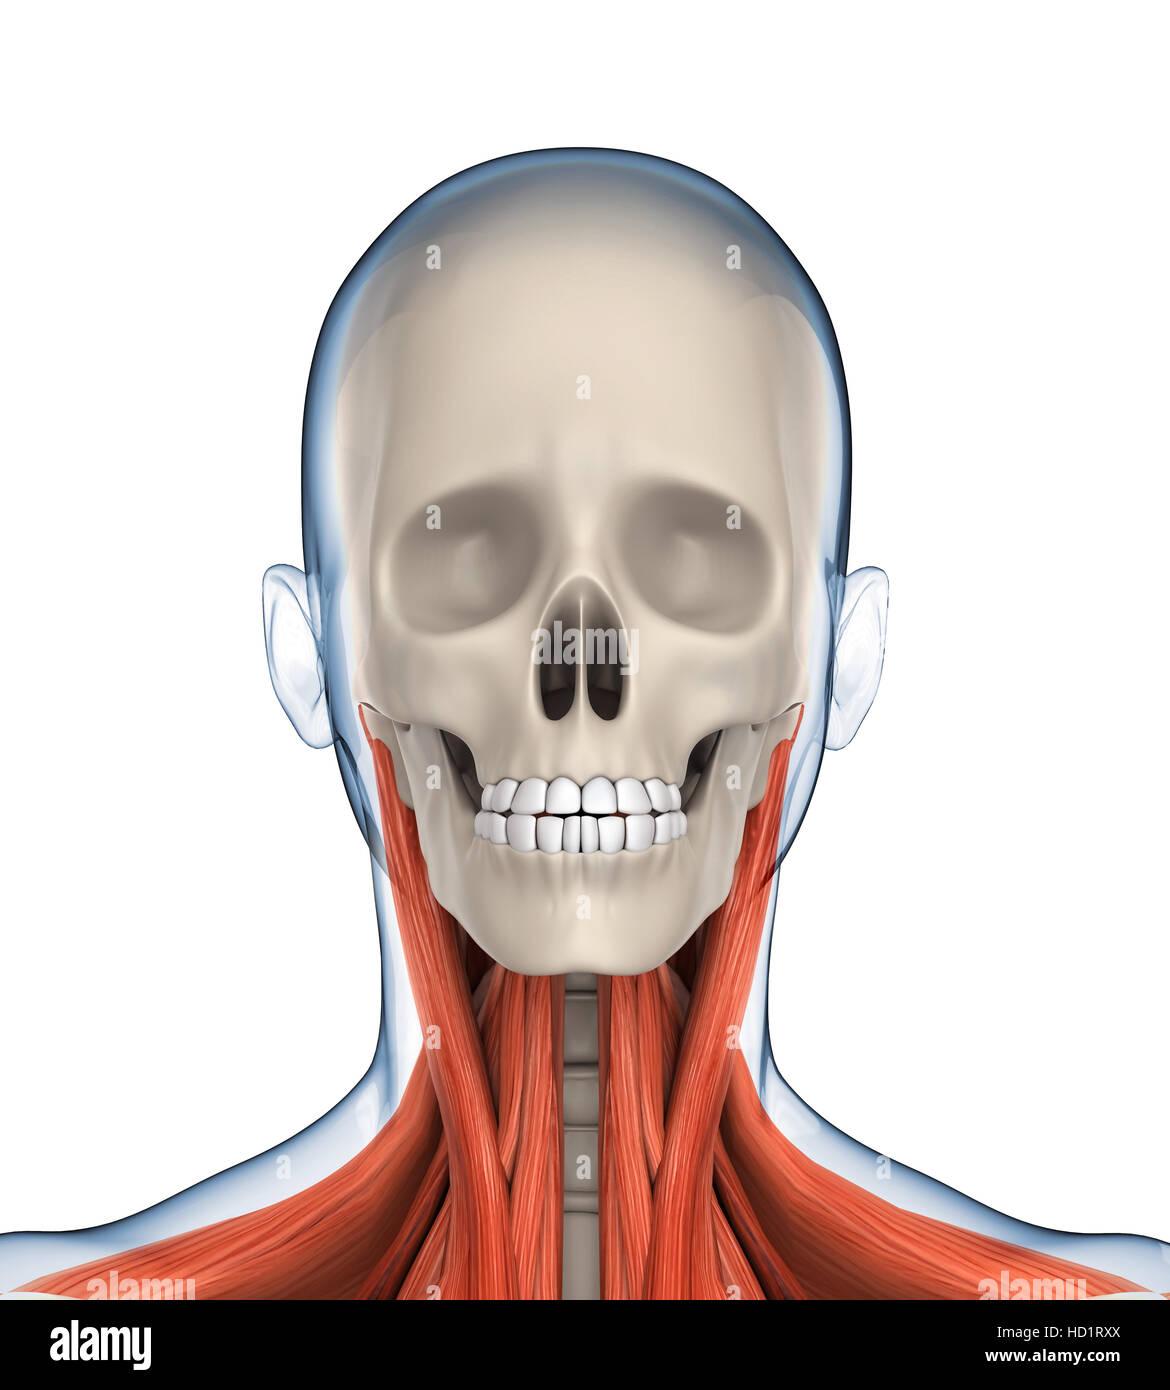 Anatomic Head Stockfotos & Anatomic Head Bilder - Alamy